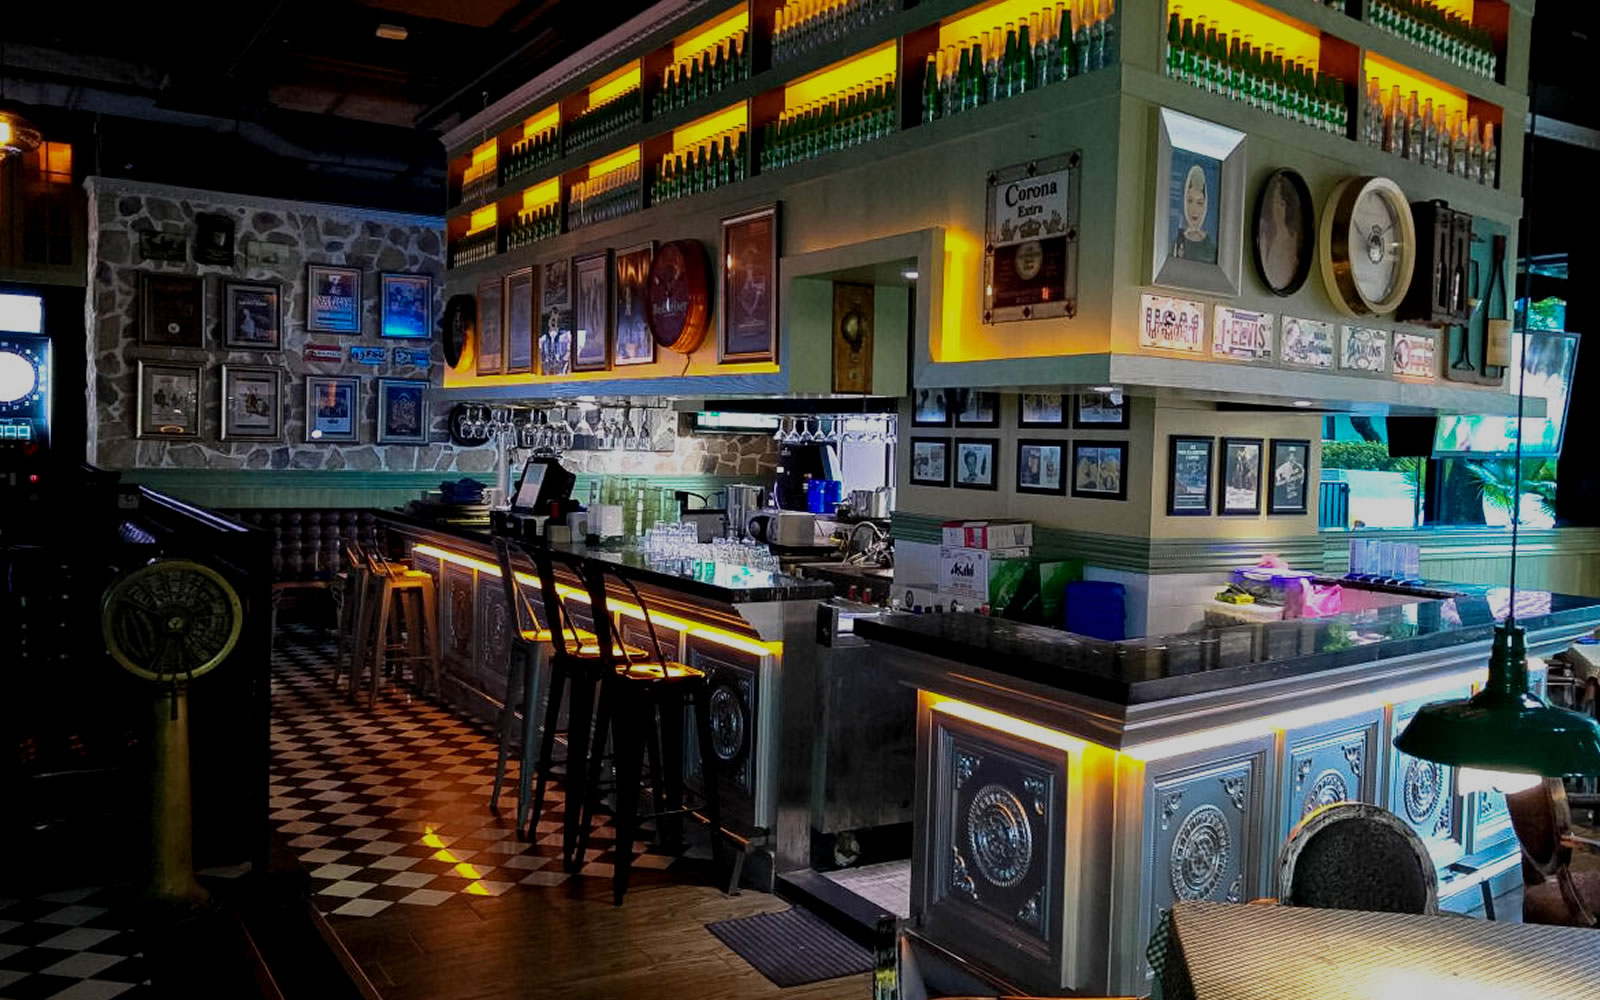 Kwai Fong 葵芳葵芳閣歌德餐廳酒吧 桌球 飛鏢